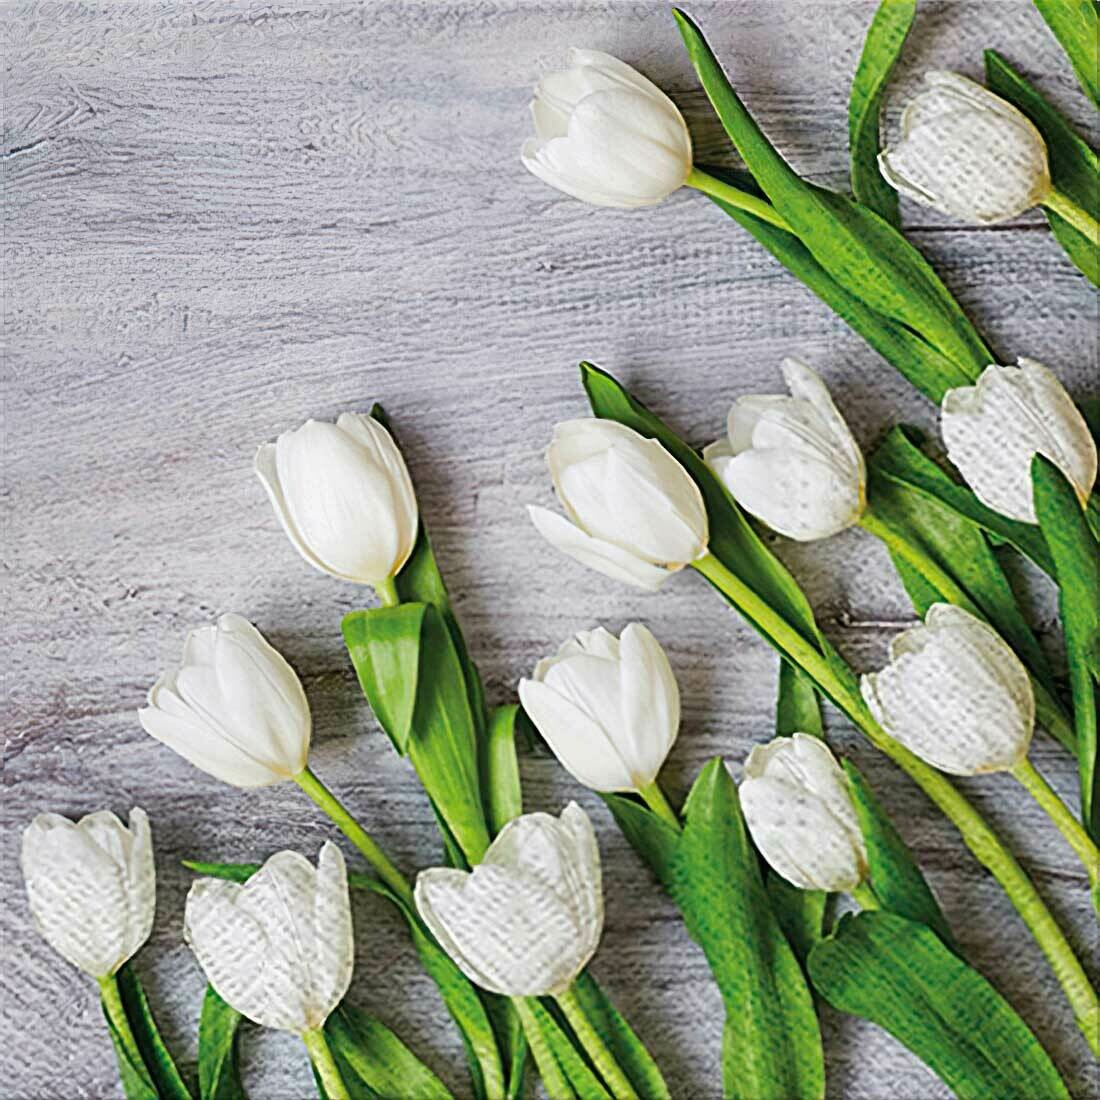 Decoupage Paper Napkins - Floral - White Tulips (1 Sheet)